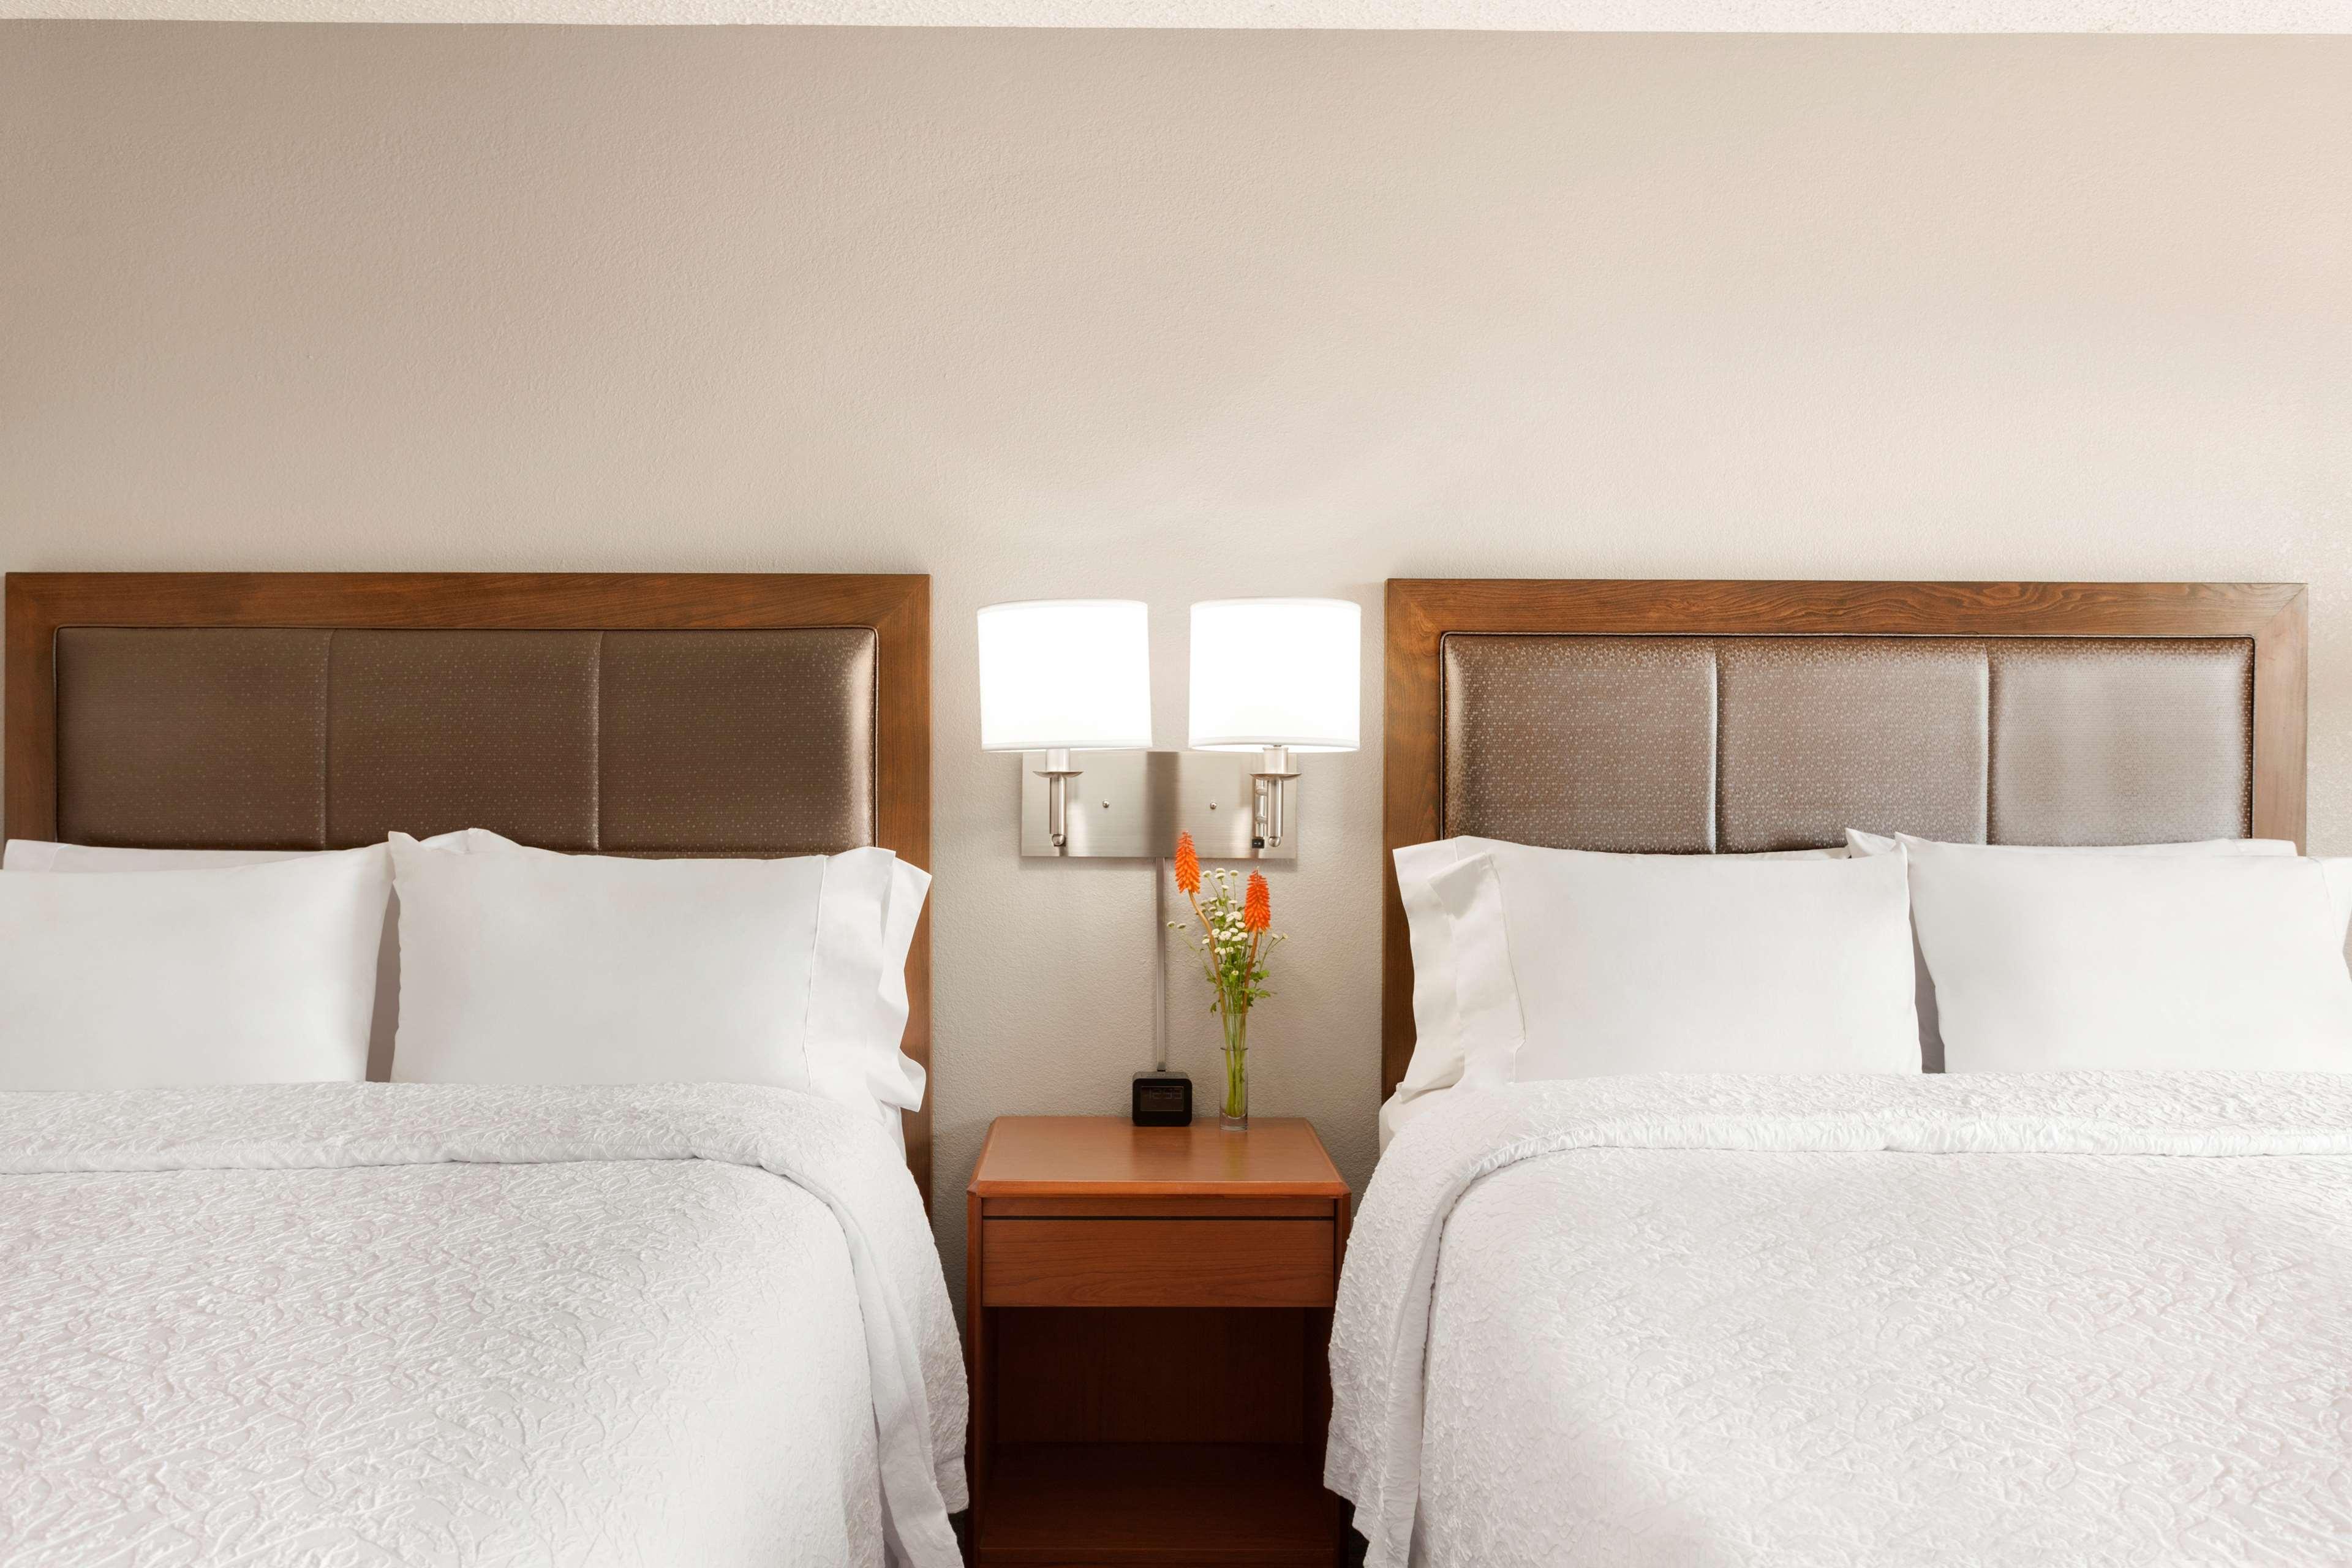 Hampton Inn & Suites Denver-Cherry Creek image 18